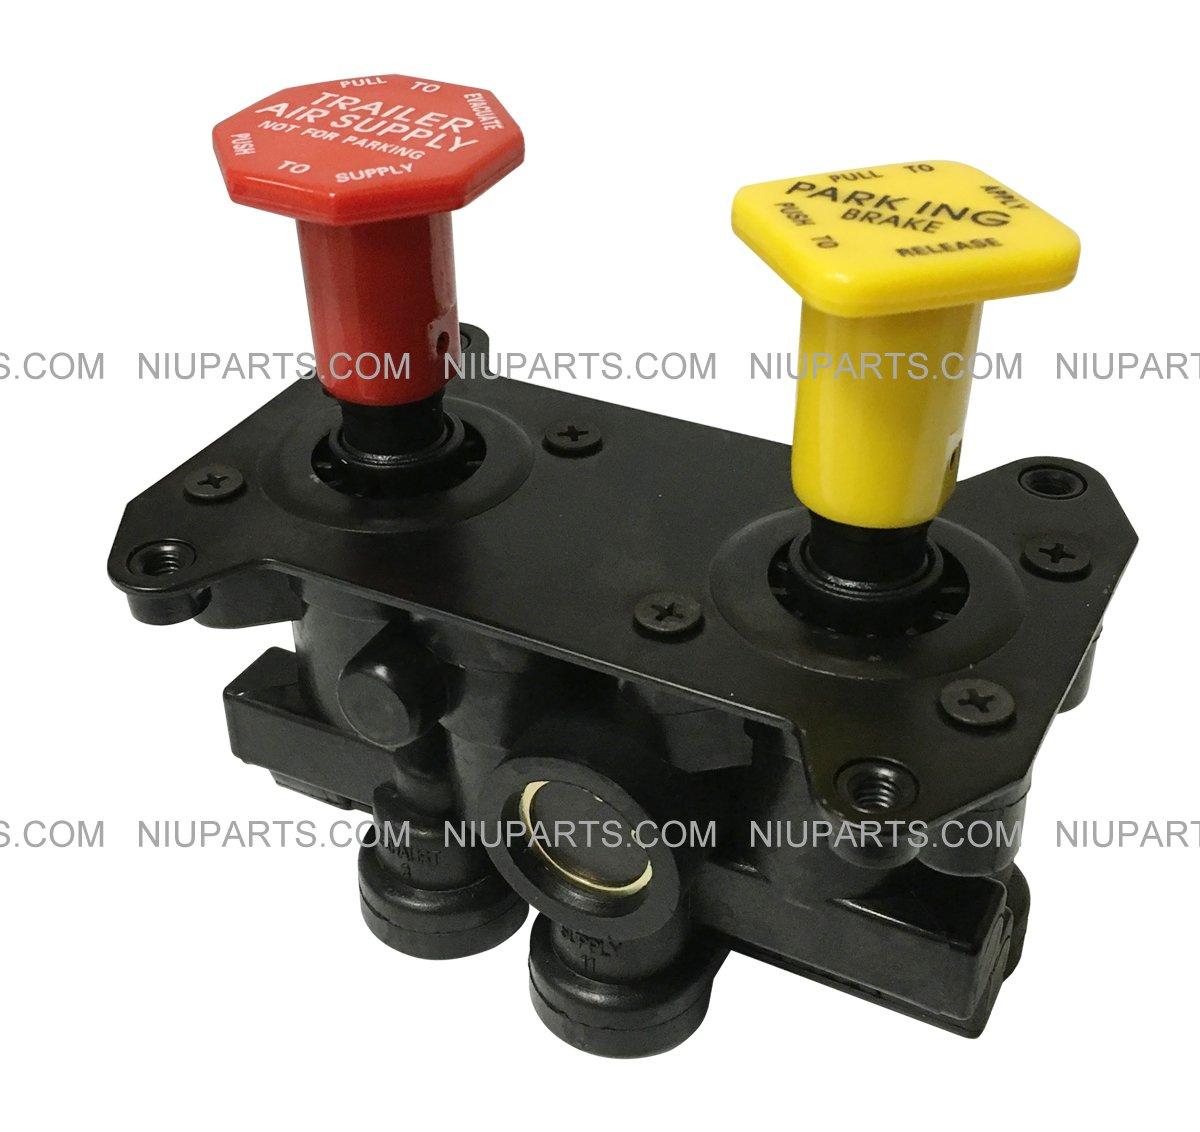 MV-3 Dash Control Brake Valve 800519, 800529, 065186 for Volvo Western- NIUPARTS